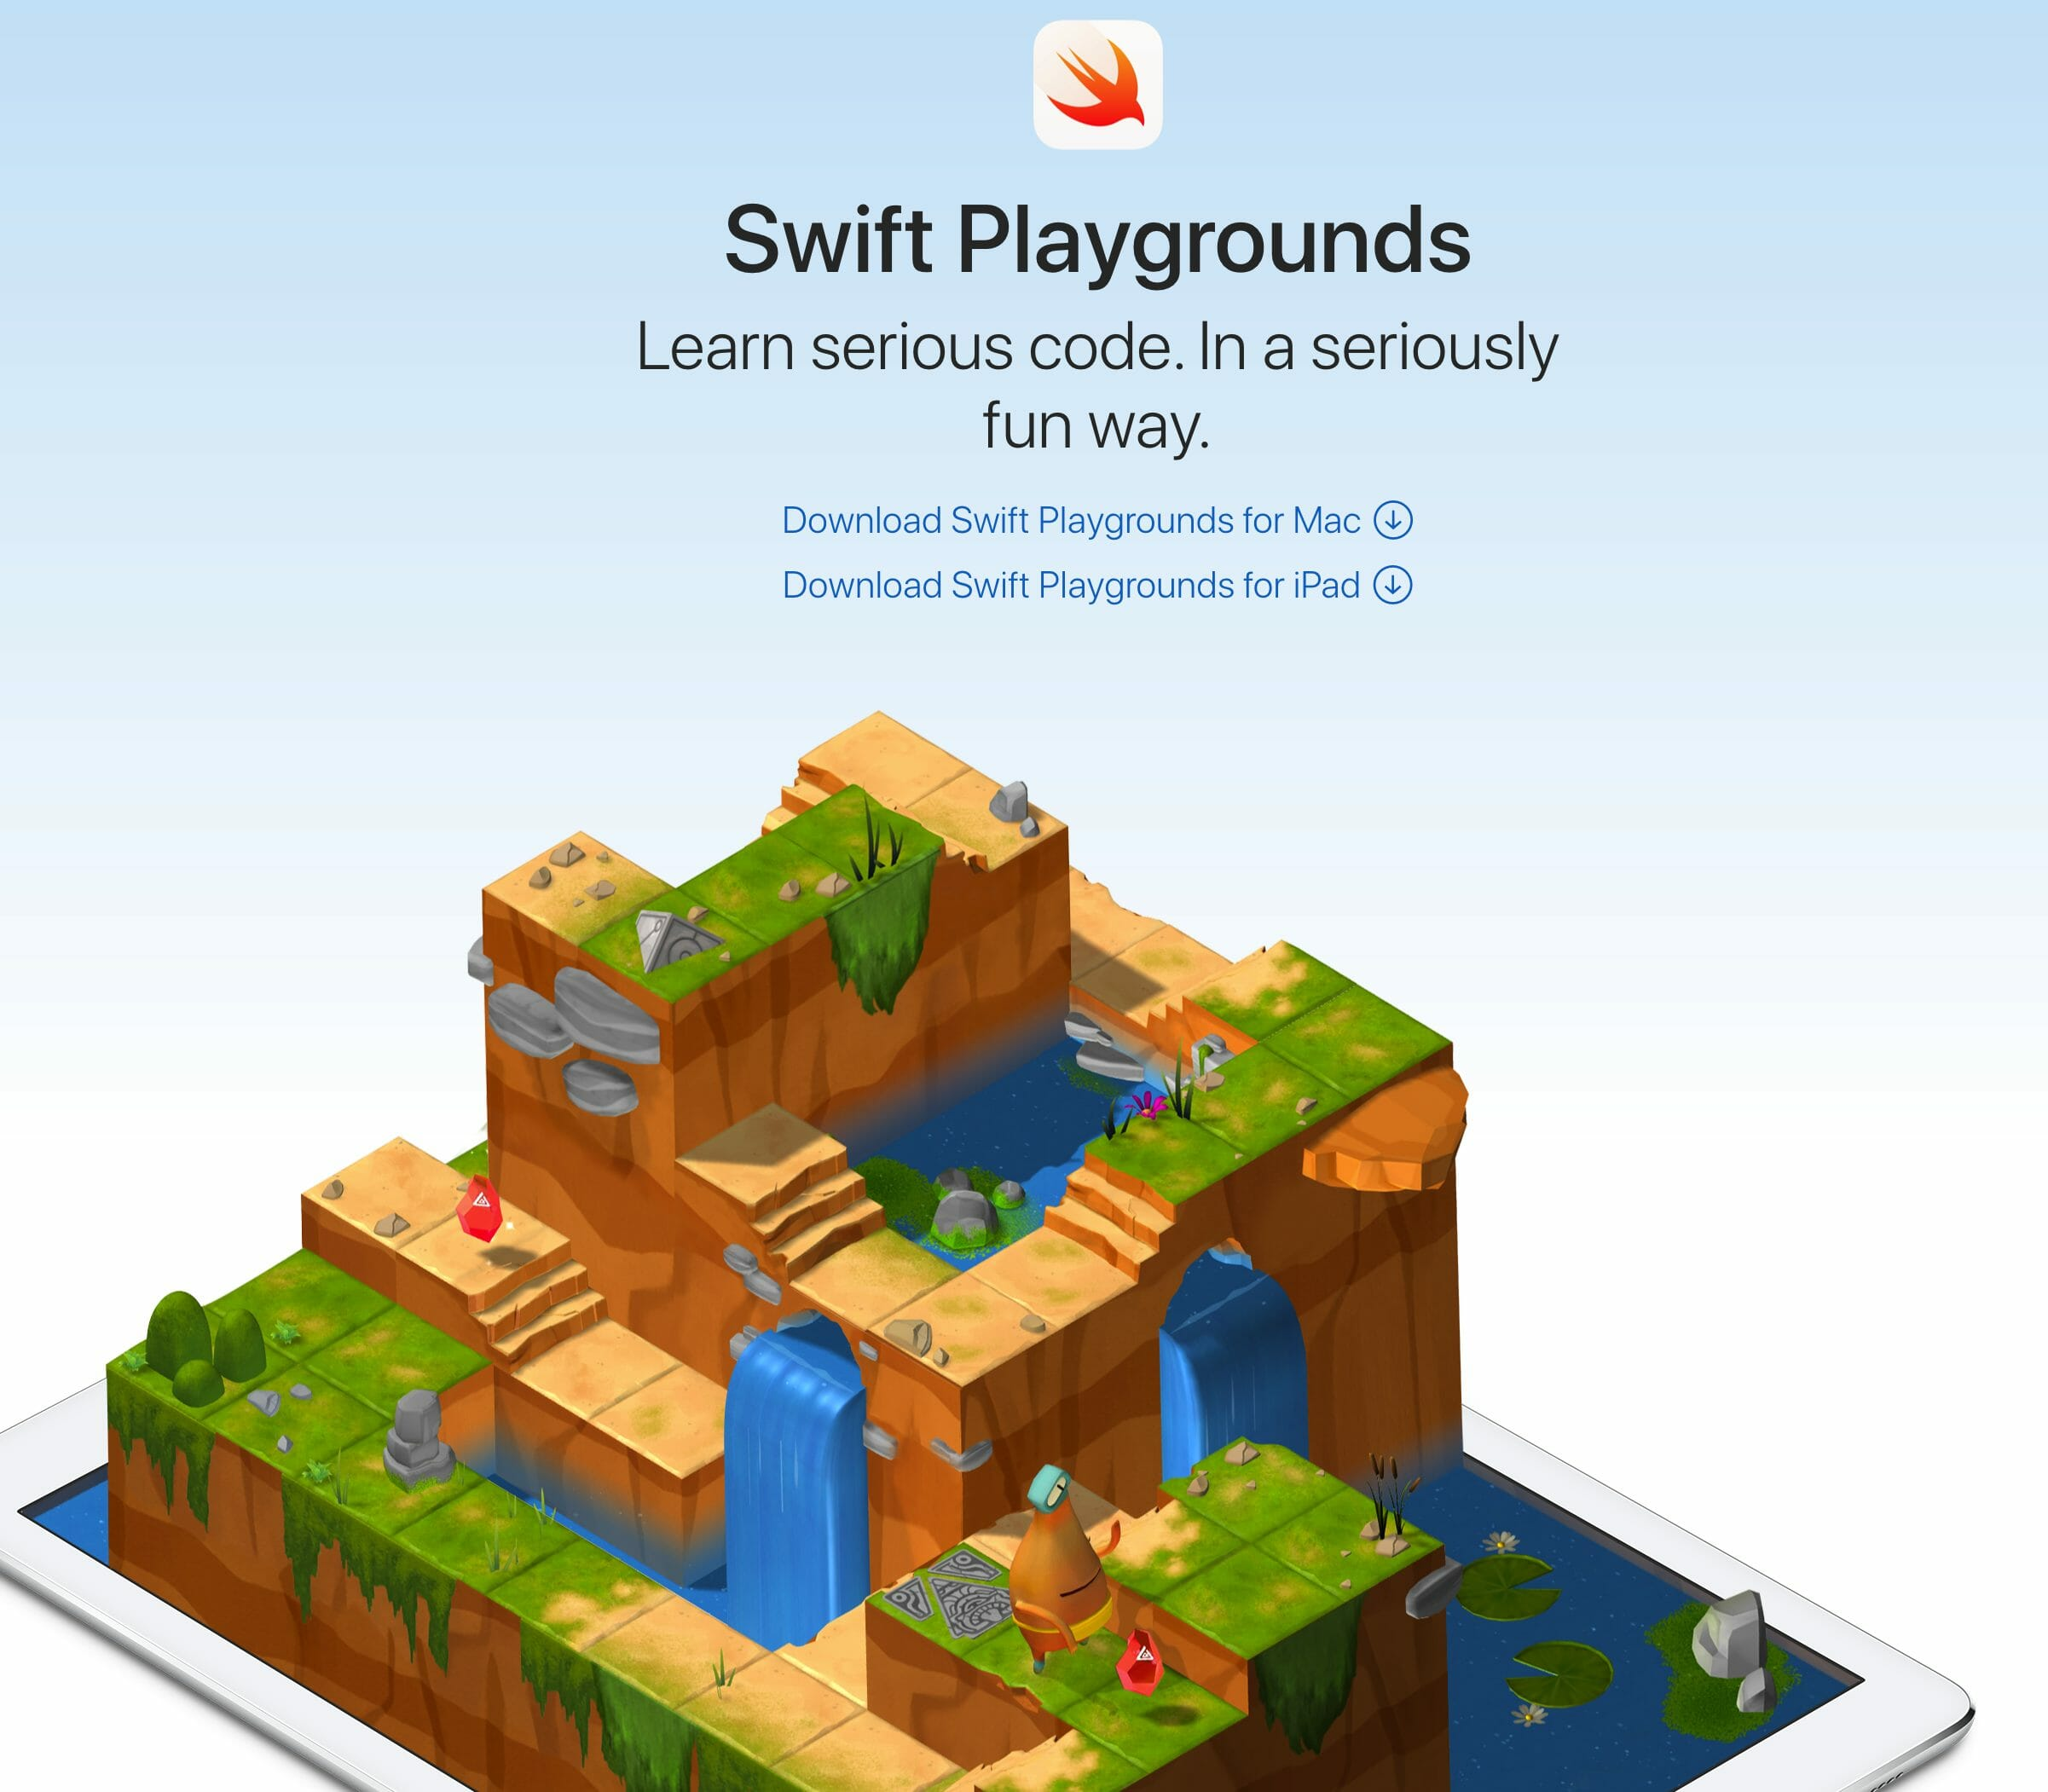 تعلم Swift Playgrounds